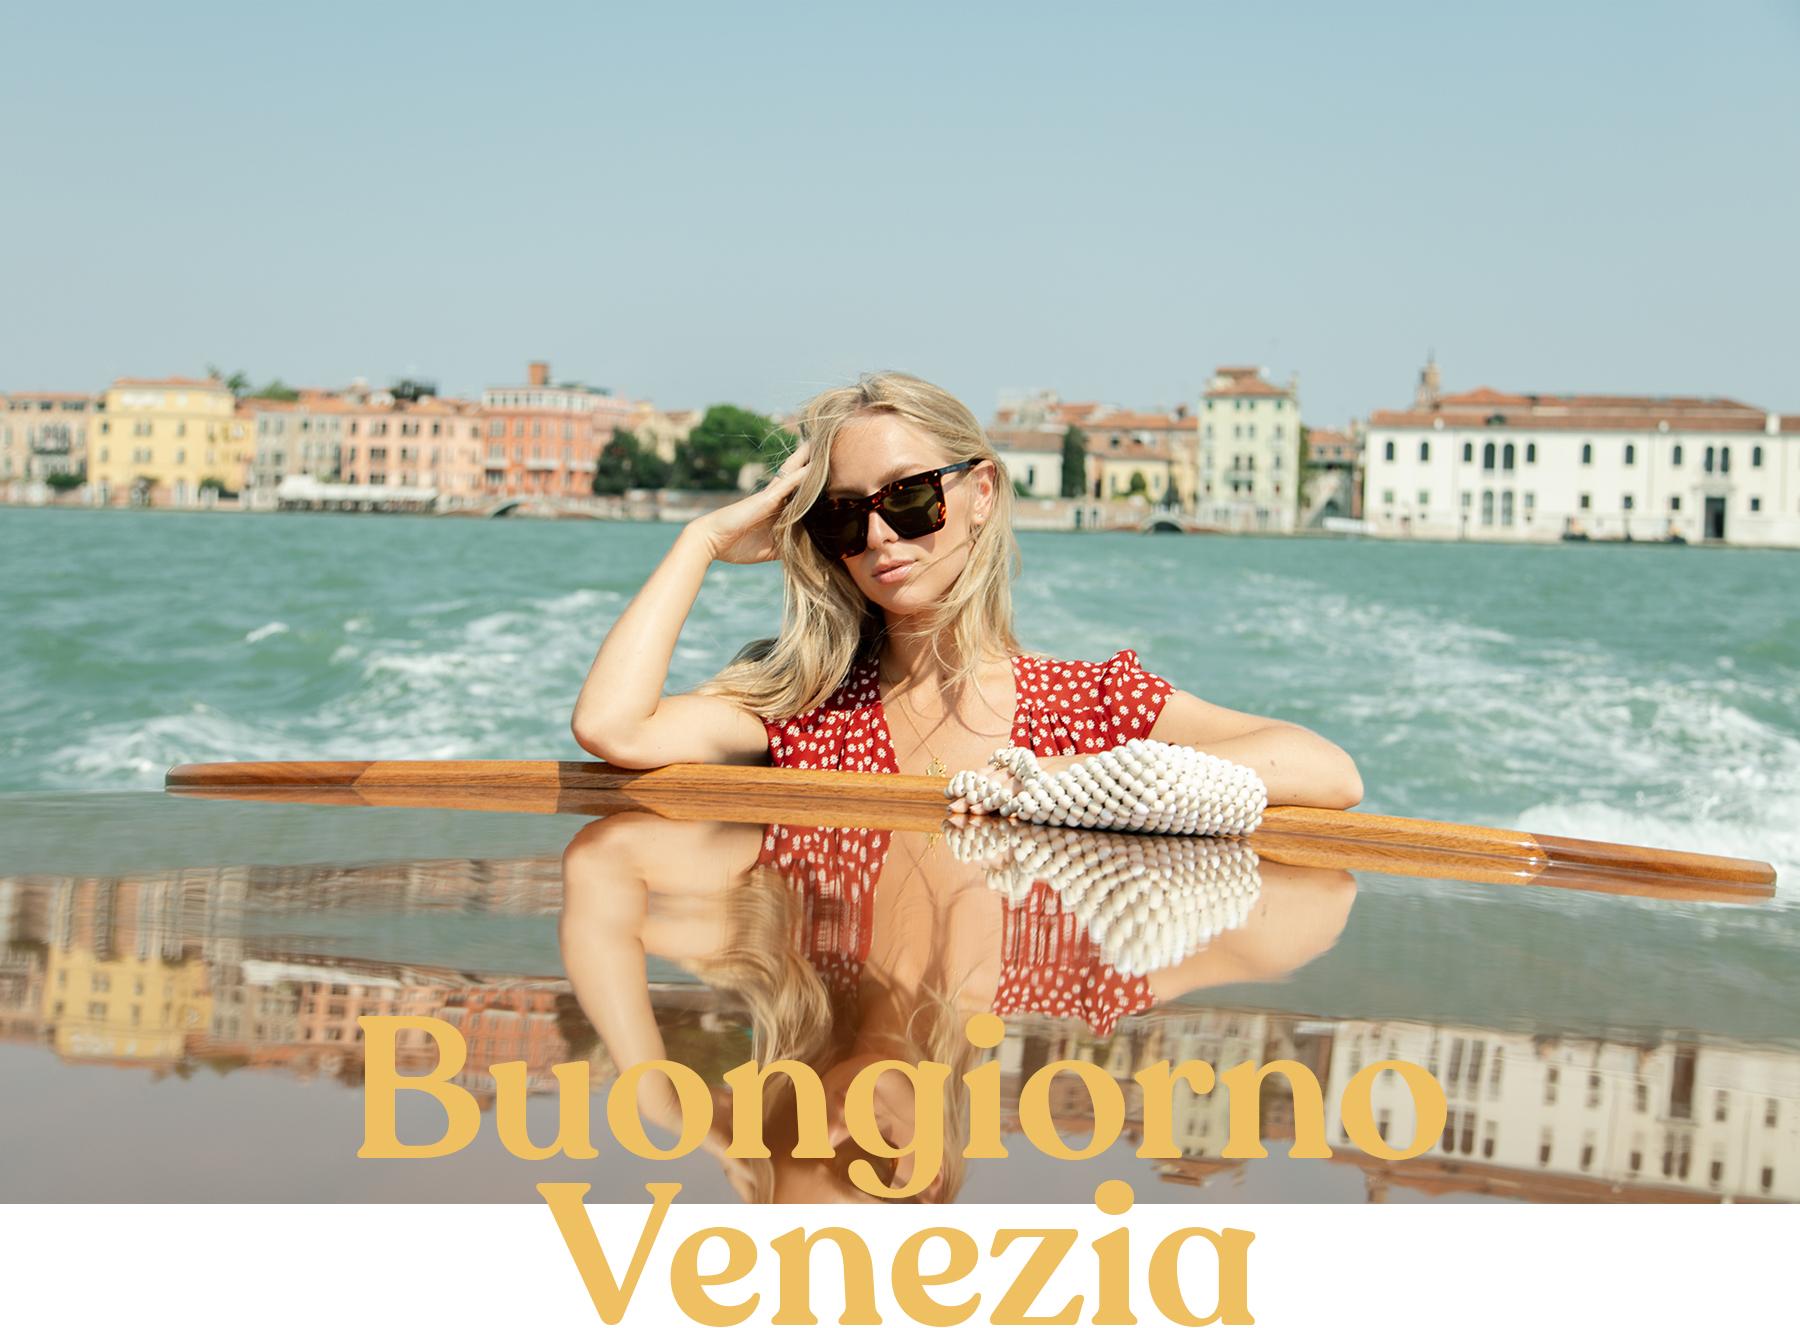 Venice_JLC_CarinOlsson_01.jpg